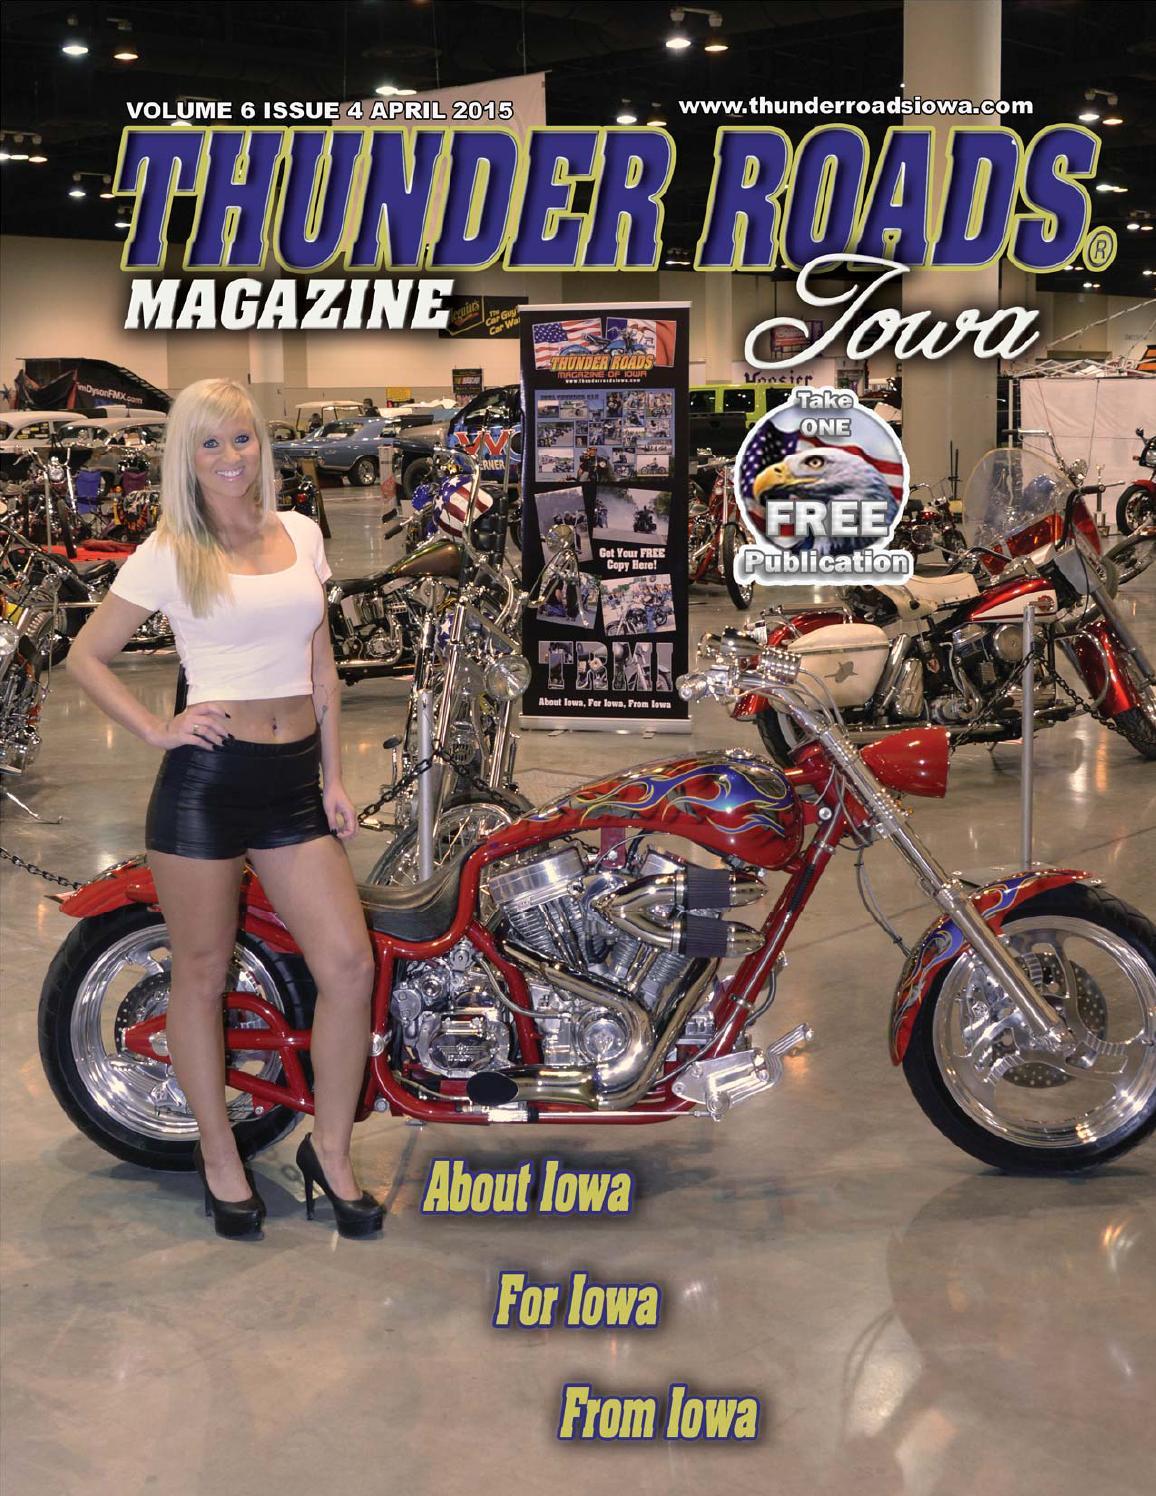 Thunder Roads Magazine Of Iowa April 2015 By Thunder Roads